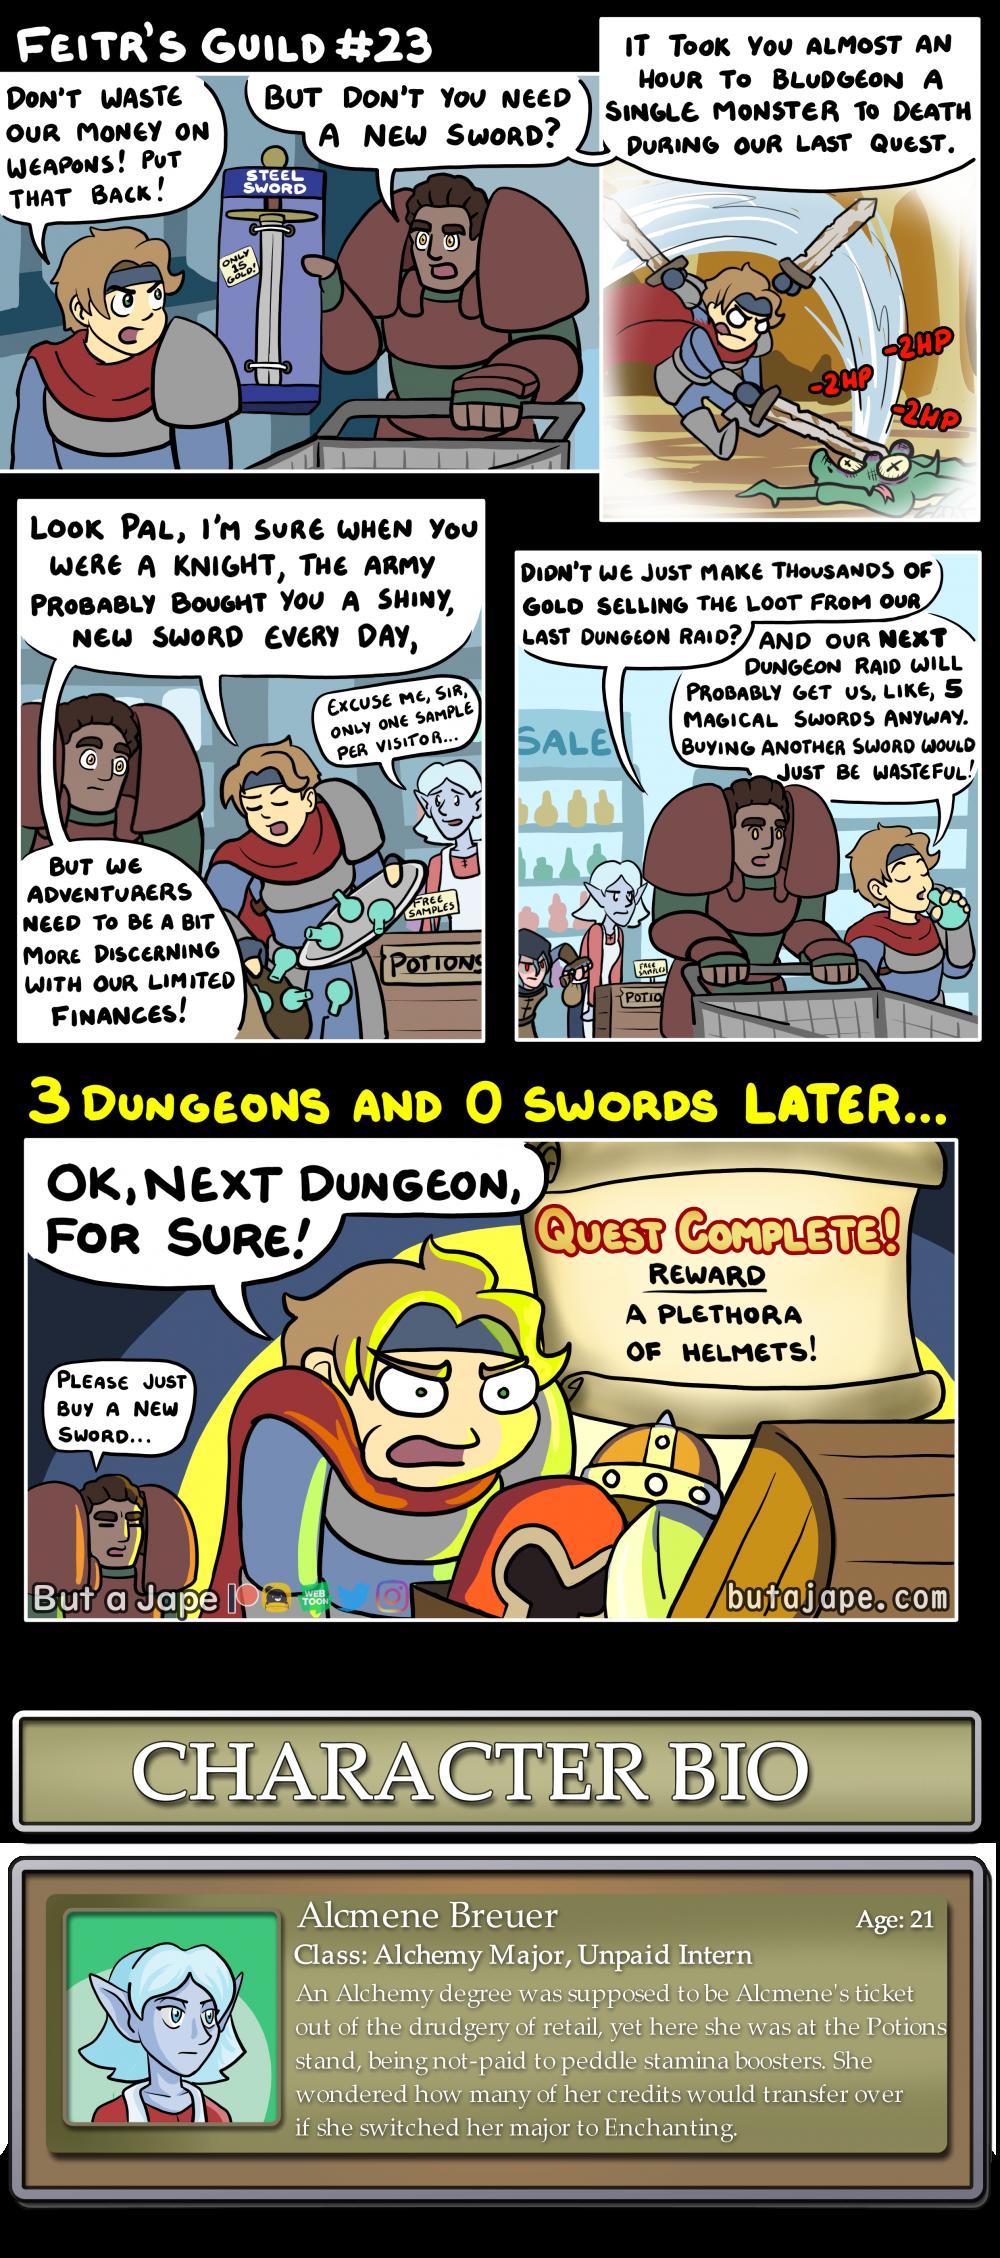 new sword comic